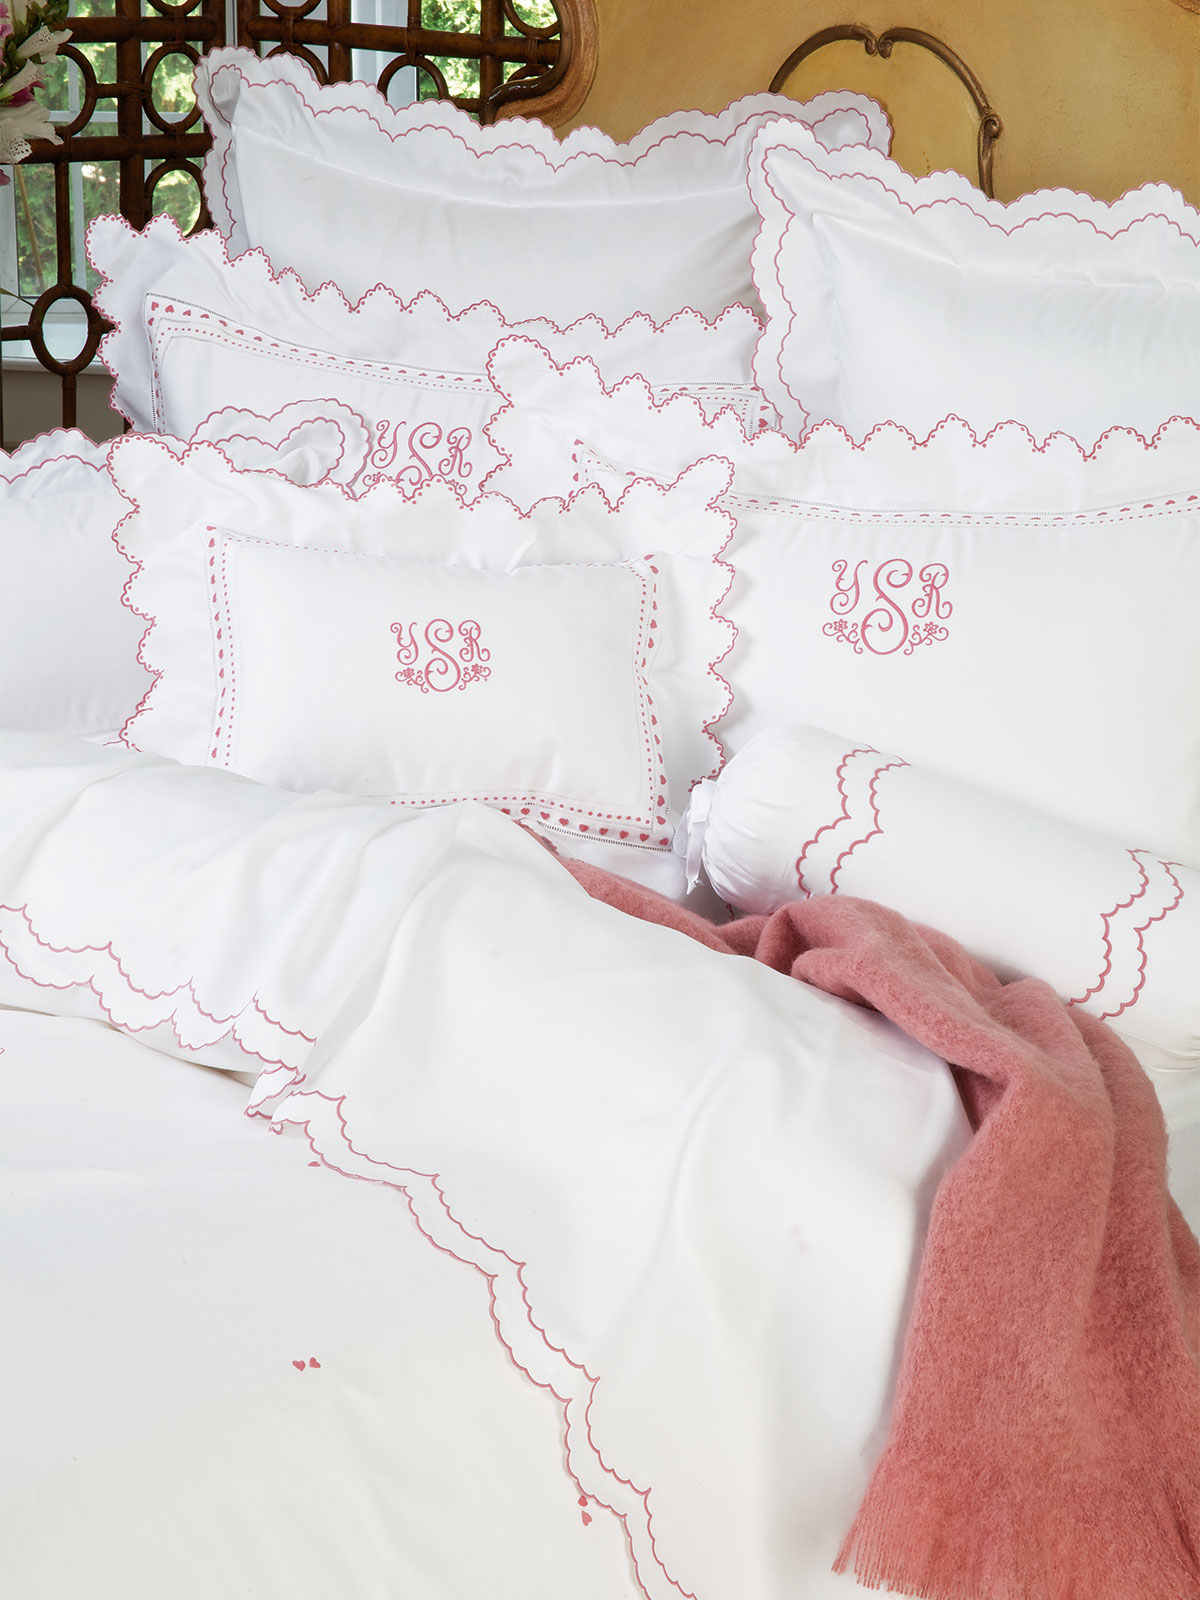 cotton white kinche scalloped scallop queen duvet cover size callington inches edge favourite quilt dsc